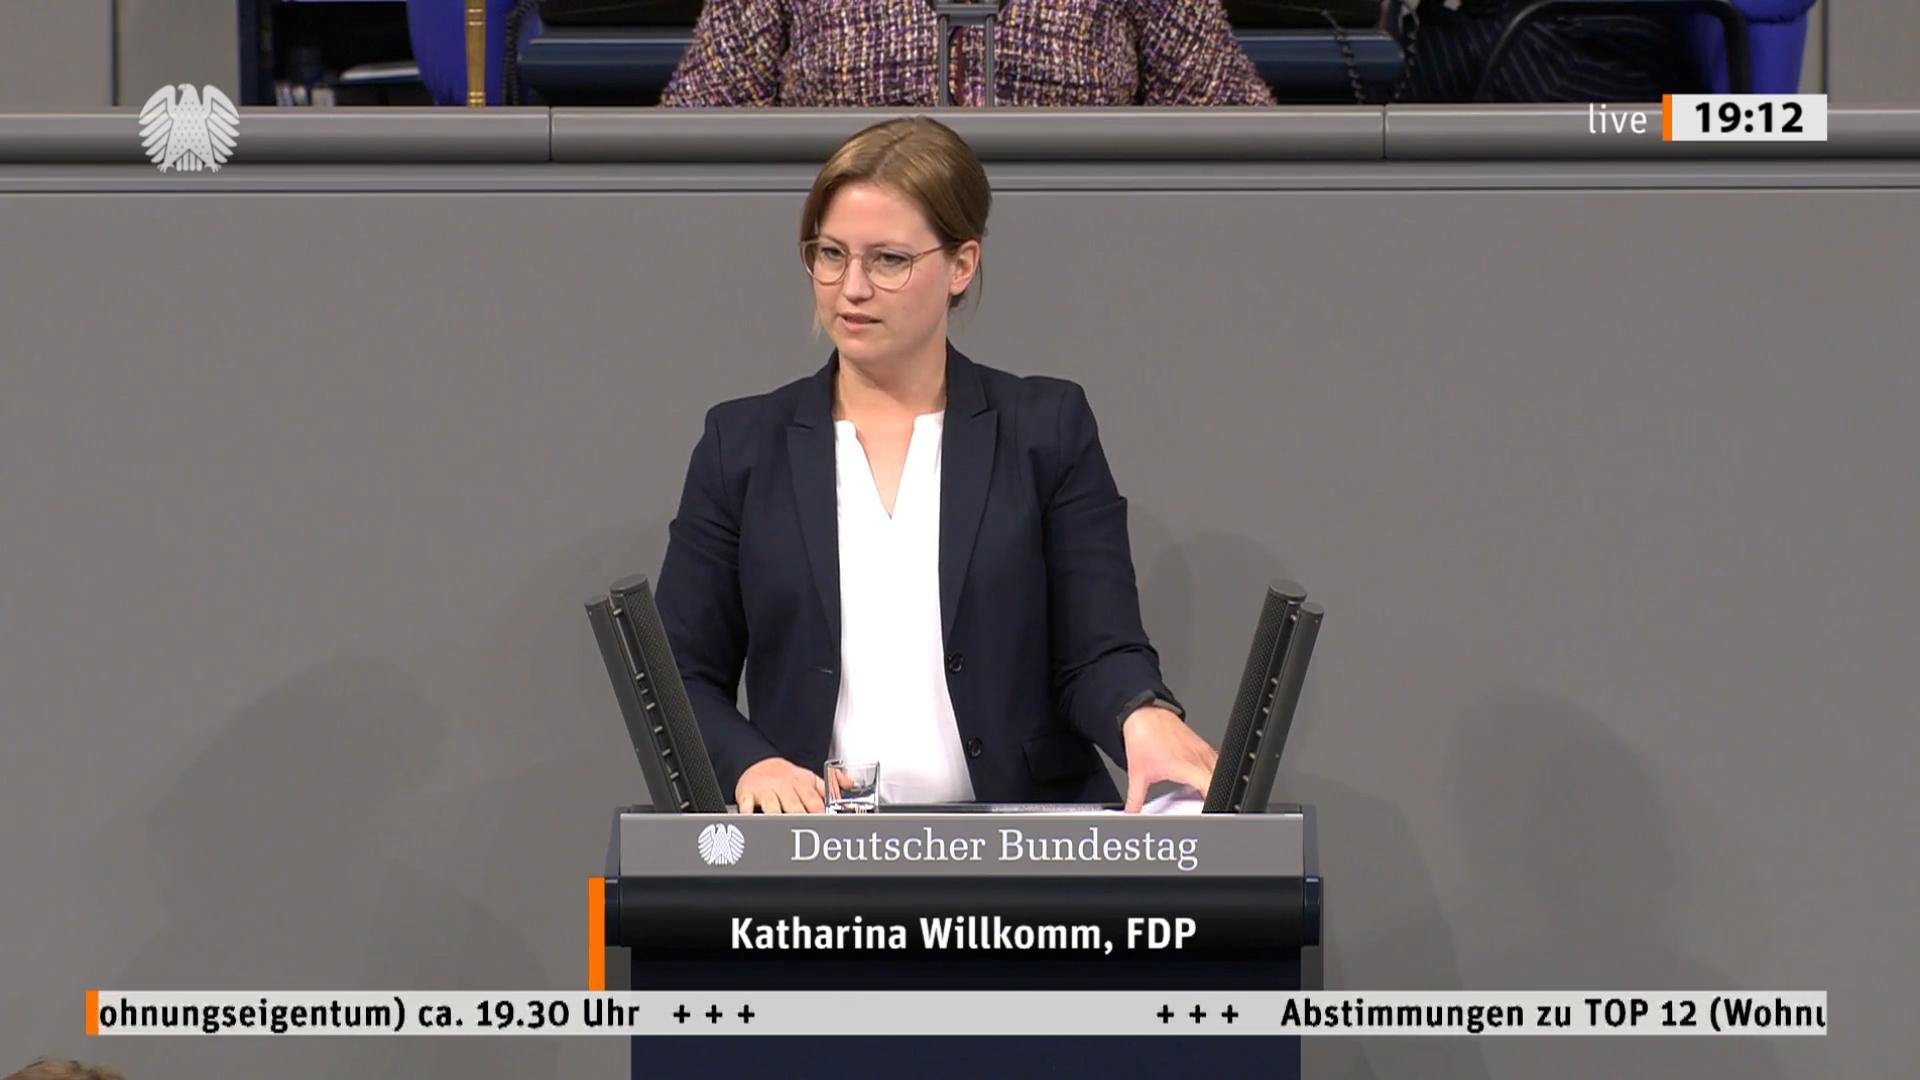 Katharina Willkomm, MdB